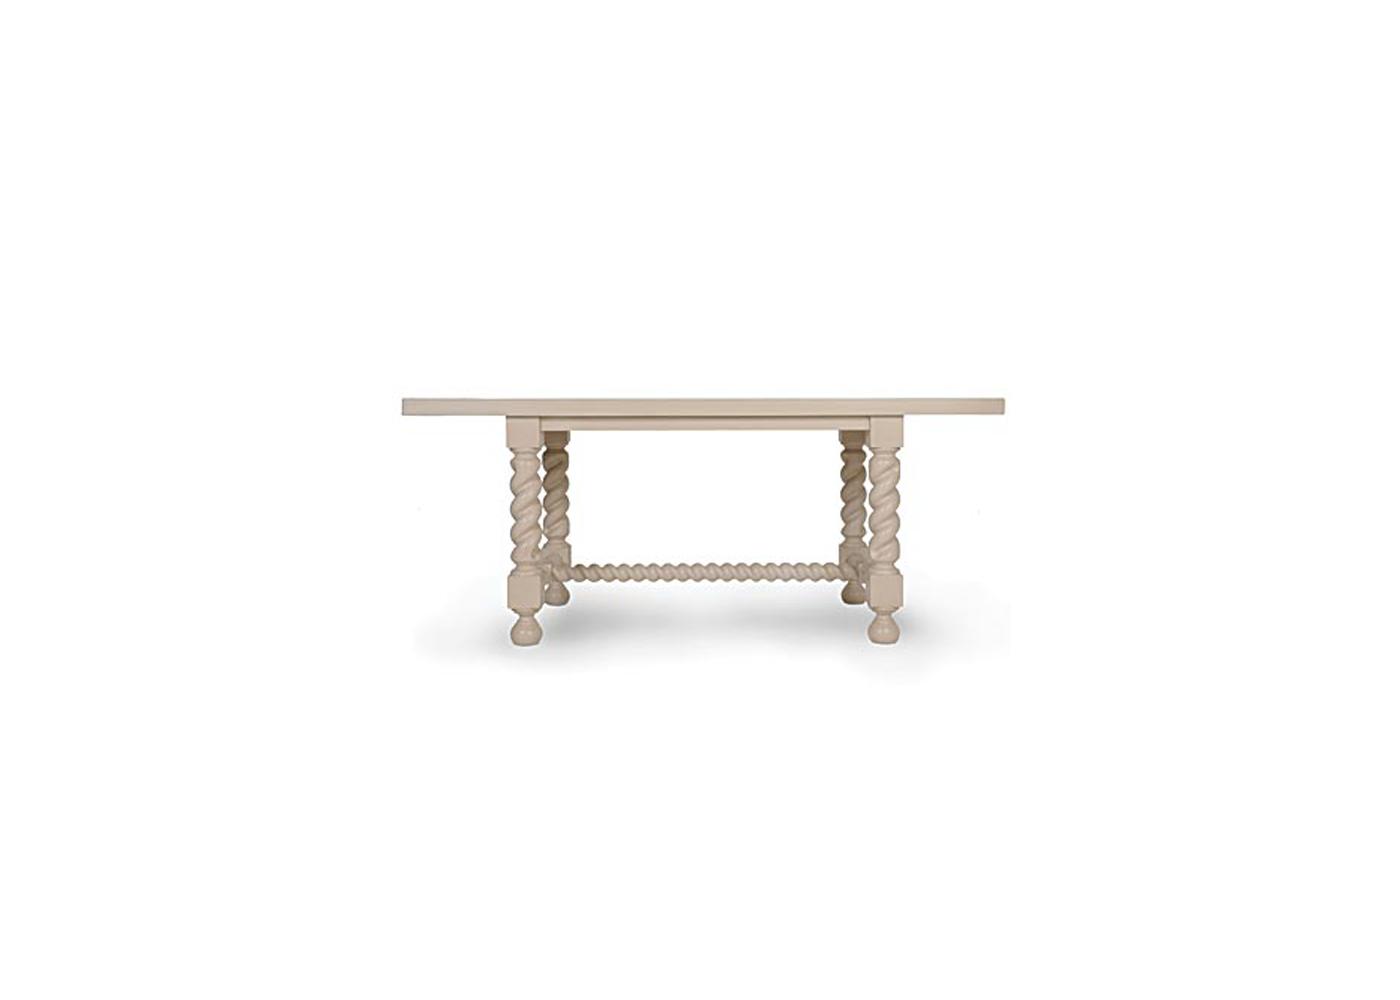 Polanco Furniture Store Ottawa Interior Decor Solutions  : diningtablesfurnitureottawa003401071 w413pxw 077PRwtablediningCanterbury from polancohomedecor.com size 1400 x 1000 png 100kB